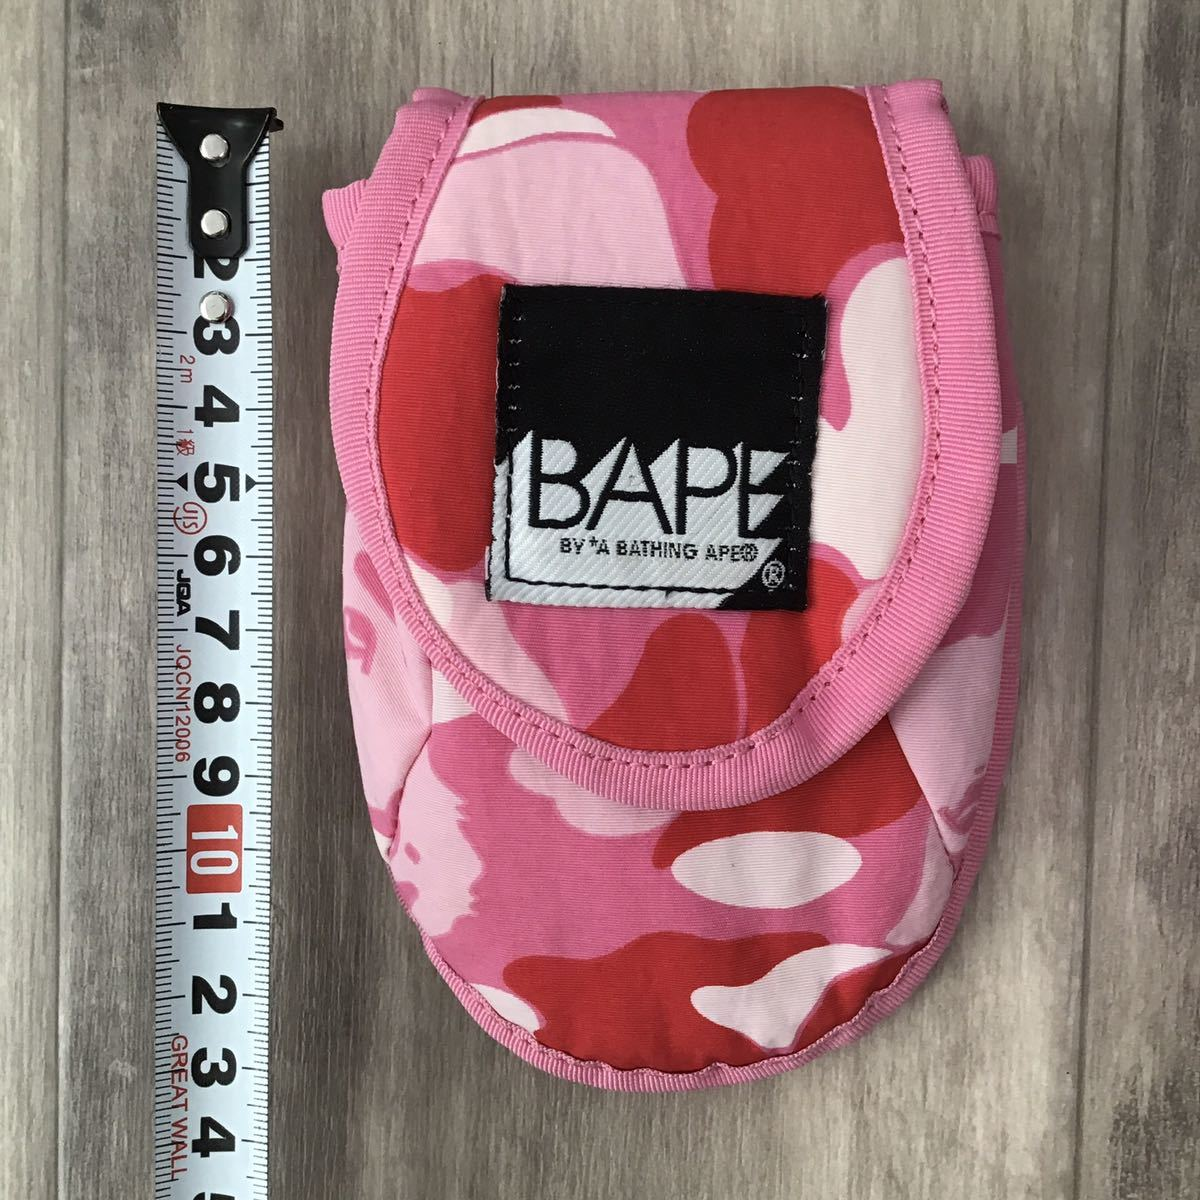 ABC camo pink ポーチ a bathing ape BAPE エイプ ベイプ アベイシングエイプ ABCカモ ピンク 迷彩 ウエスト ポーチ